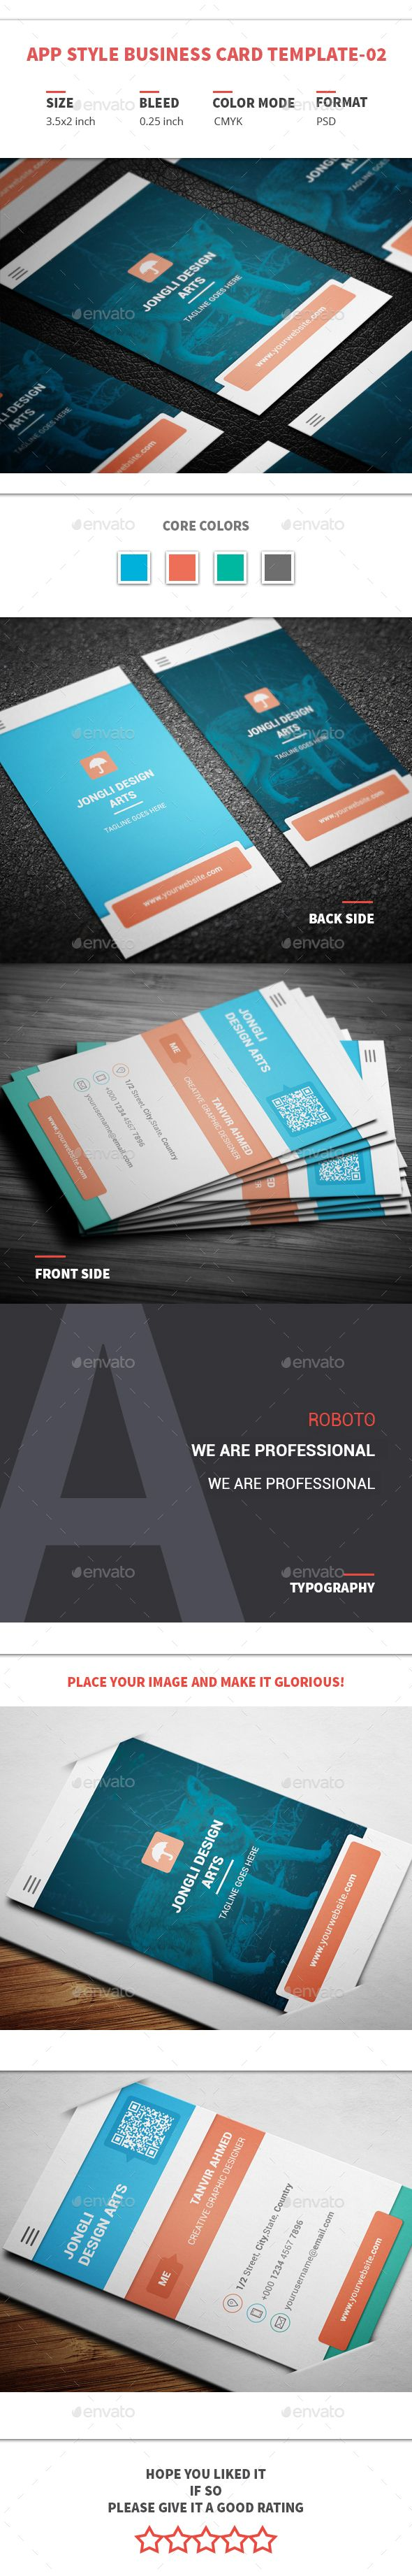 Business card app ratings choice image card design and card template business card app ratings image collections card design and card business card app ratings images card reheart Gallery